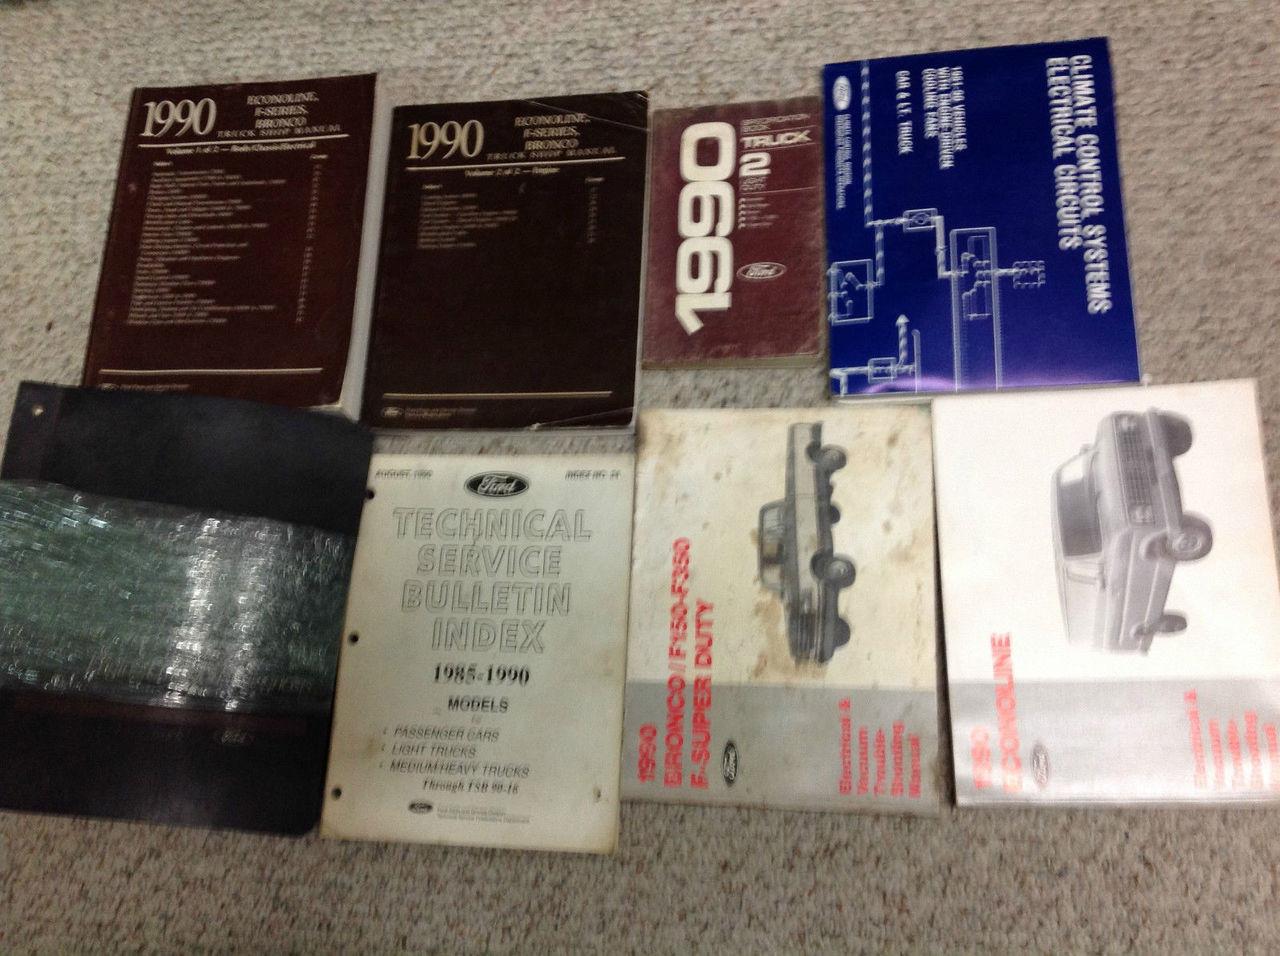 1990 Oem Ford F-150 F150 F-series Bronco Diesel Service Shop Repair Manual Set